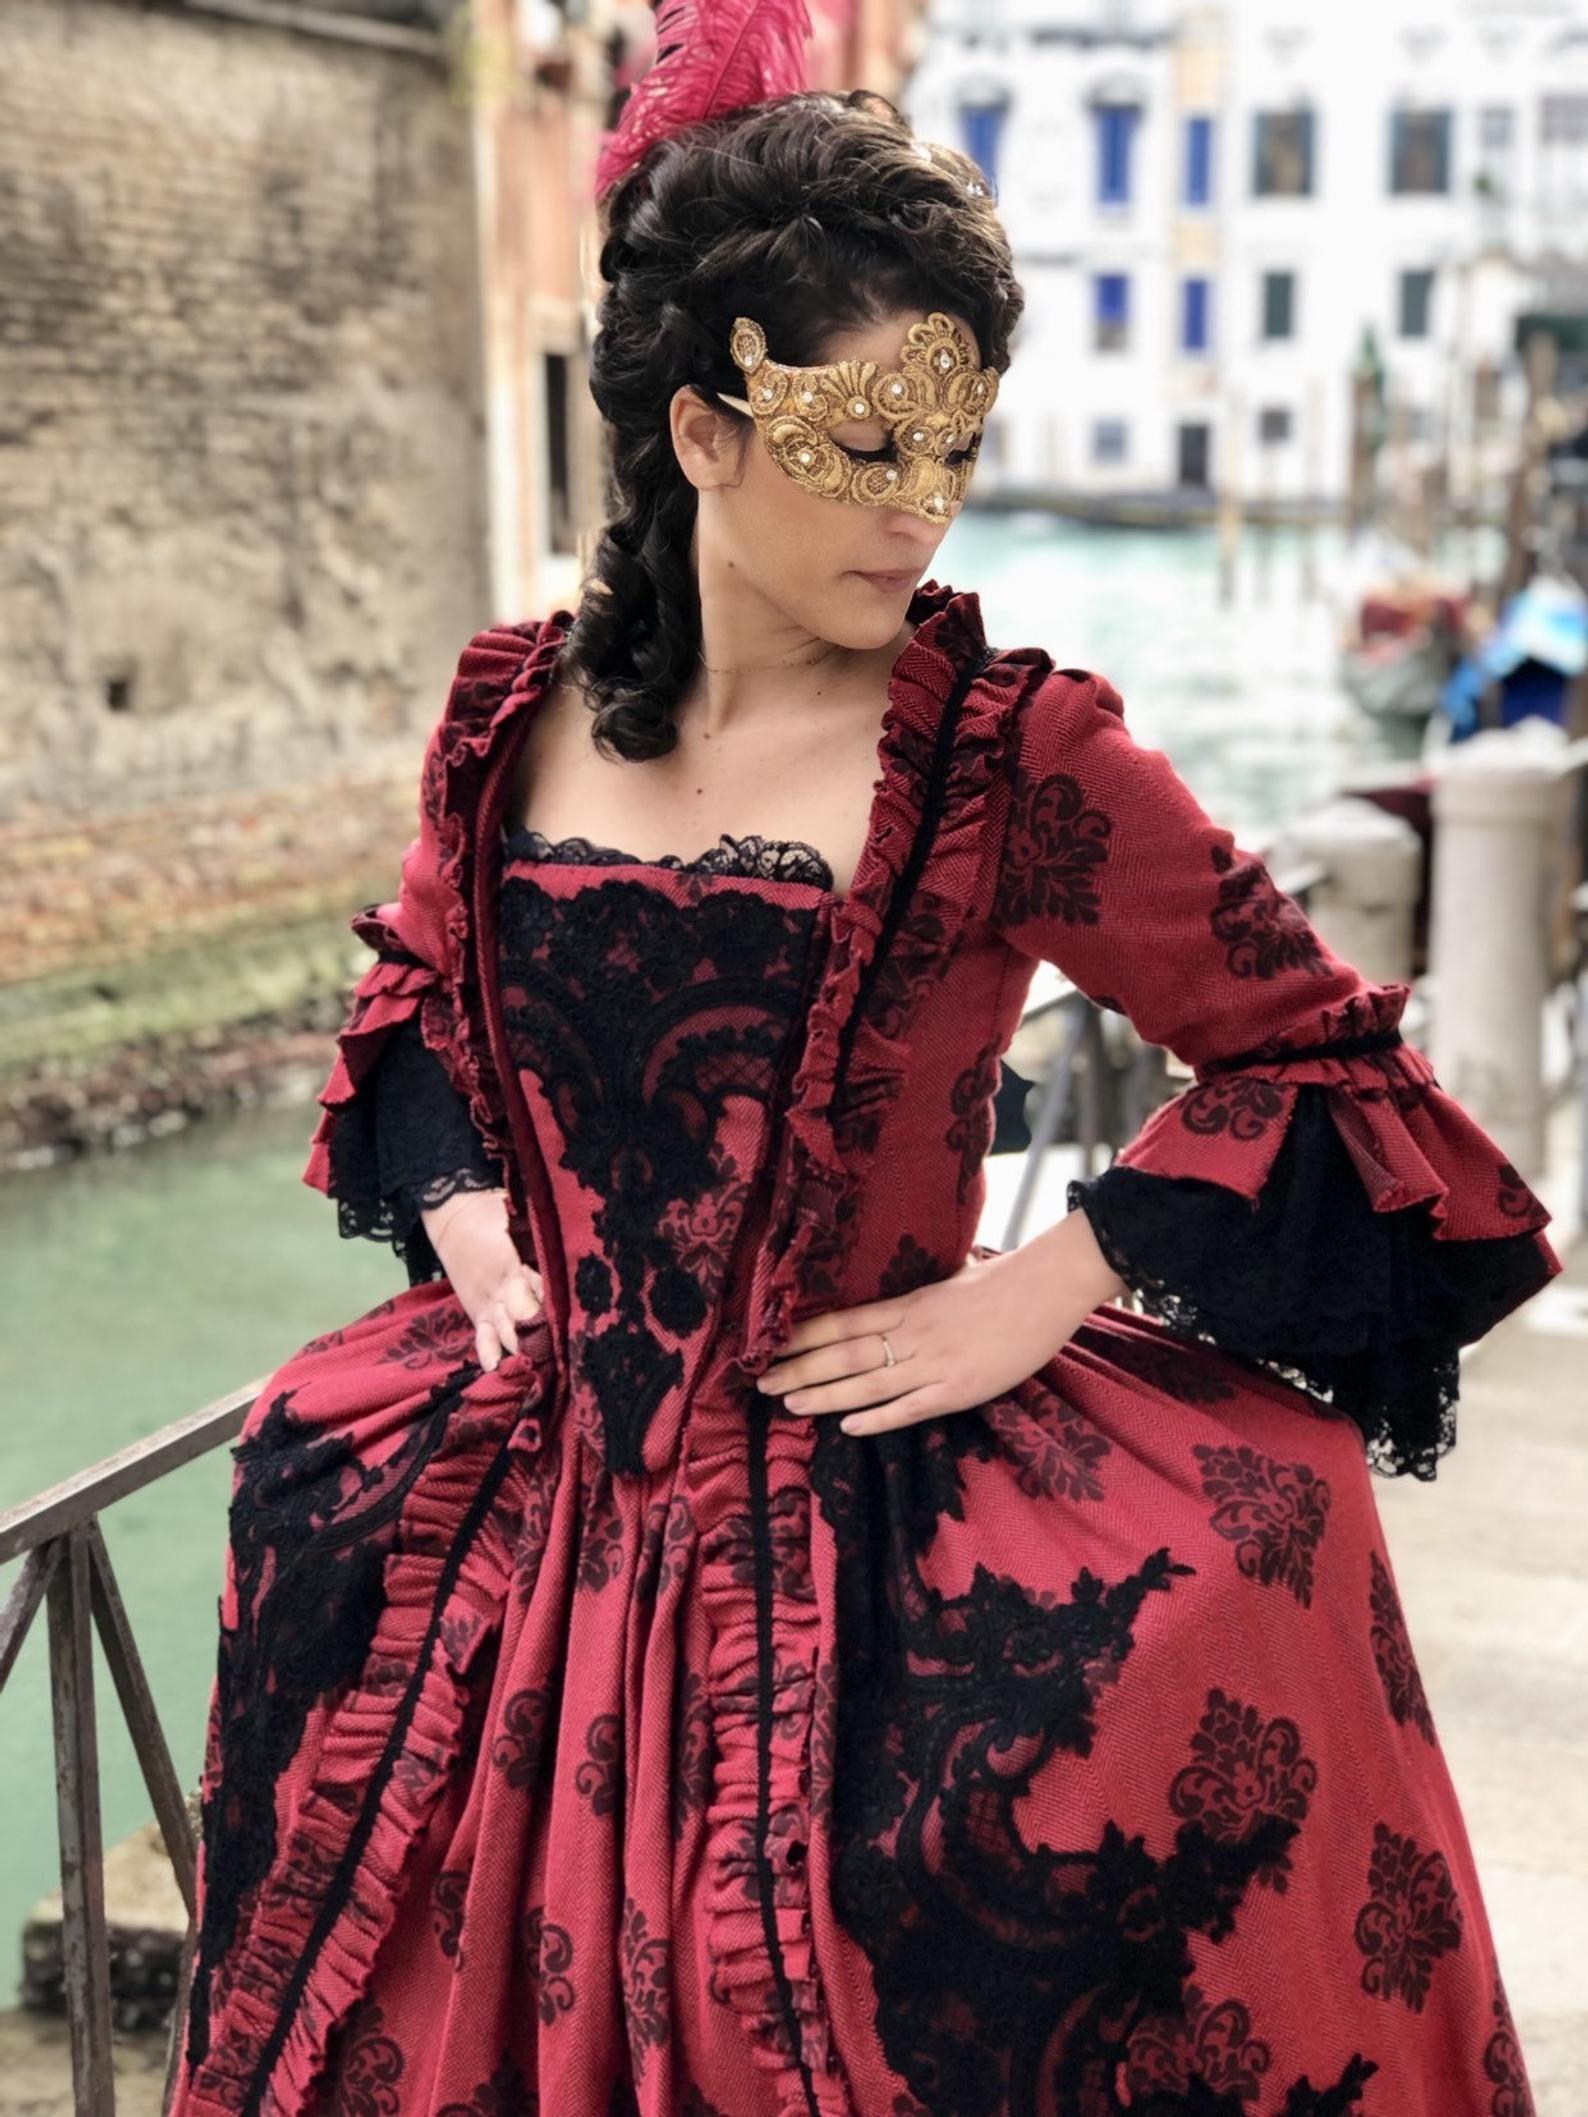 beautiful 18th century reproduction dress handmade. | etsy